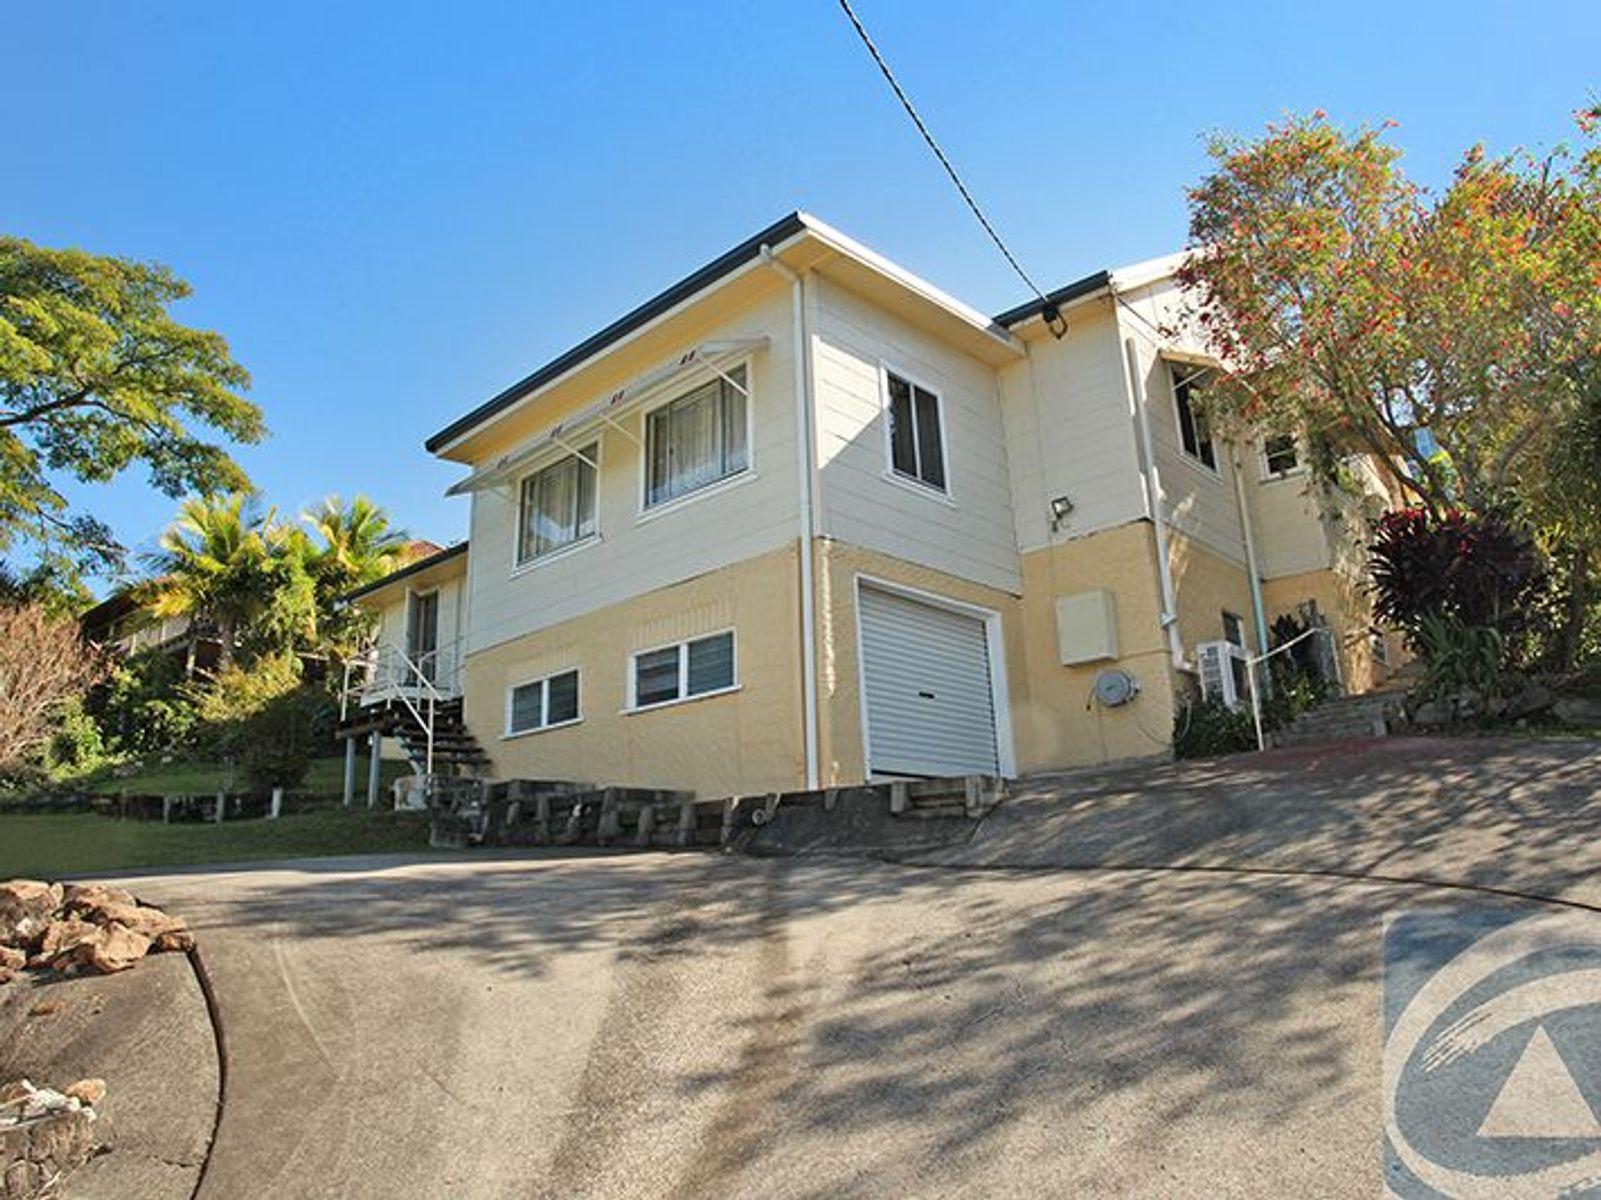 1/40 Blackall Terrace, Nambour, QLD 4560